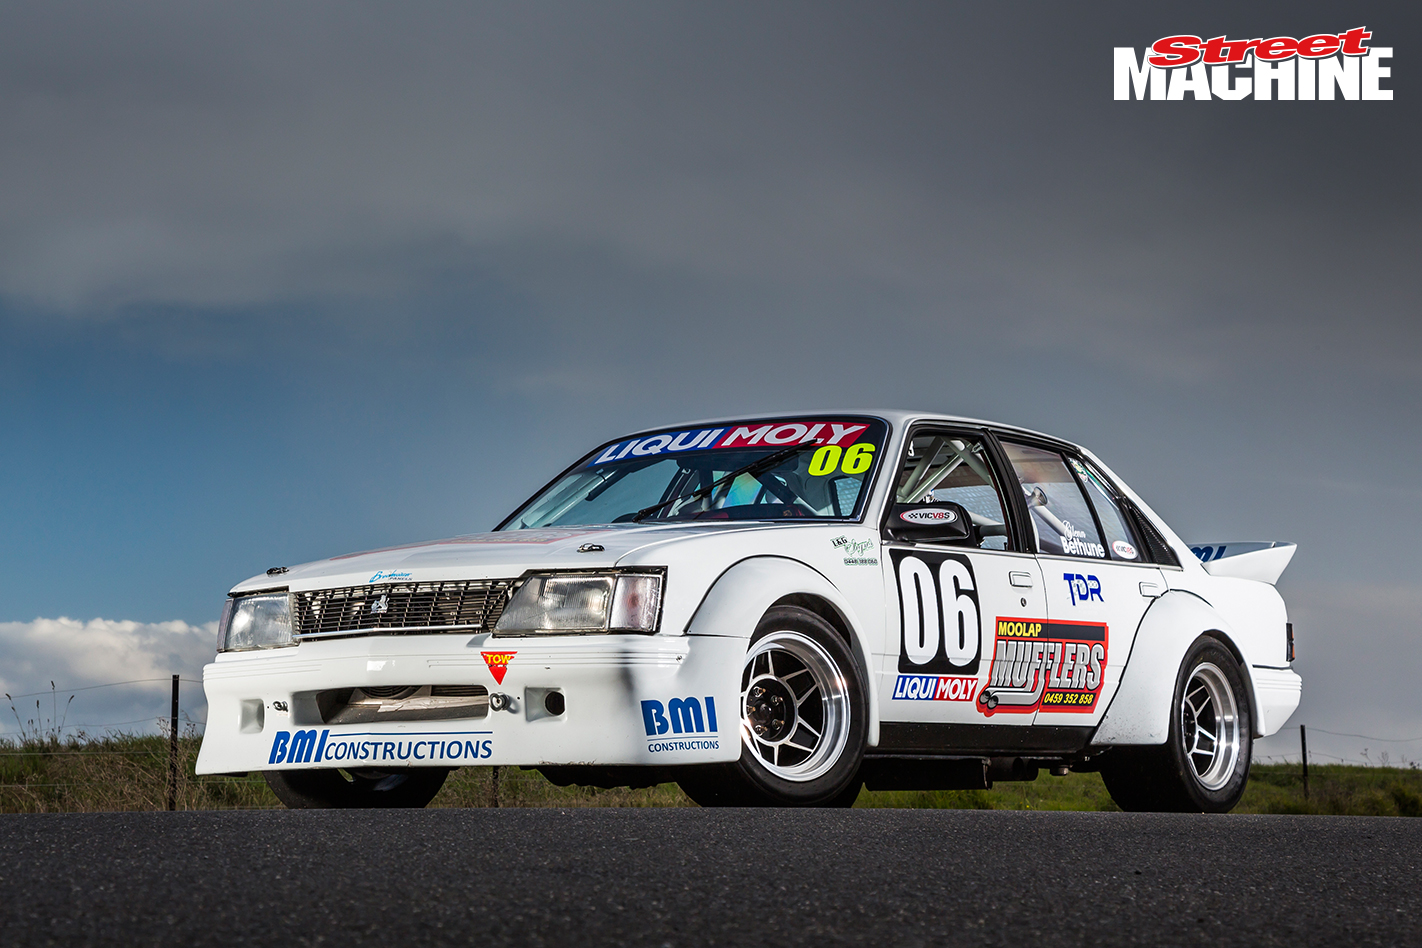 VH Holden Race Car